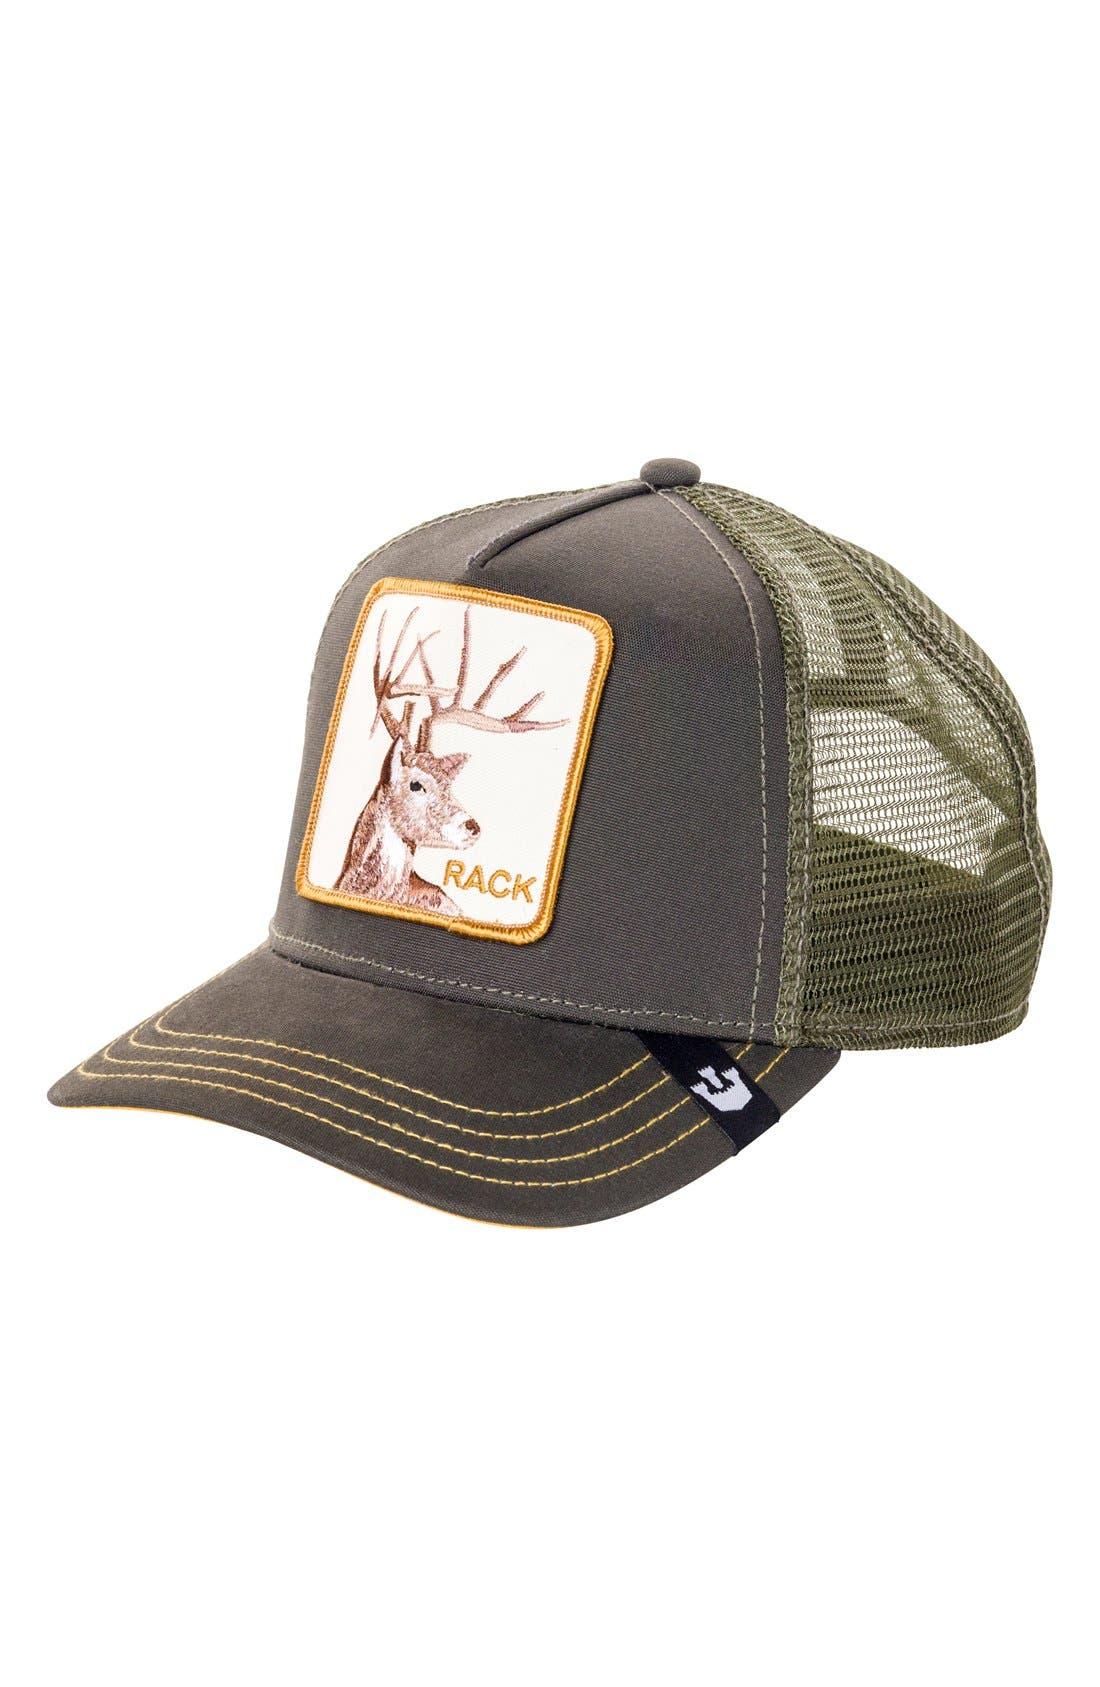 Alternate Image 1 Selected - Goorin Brothers 'Animal Farm - Rack' Trucker Hat